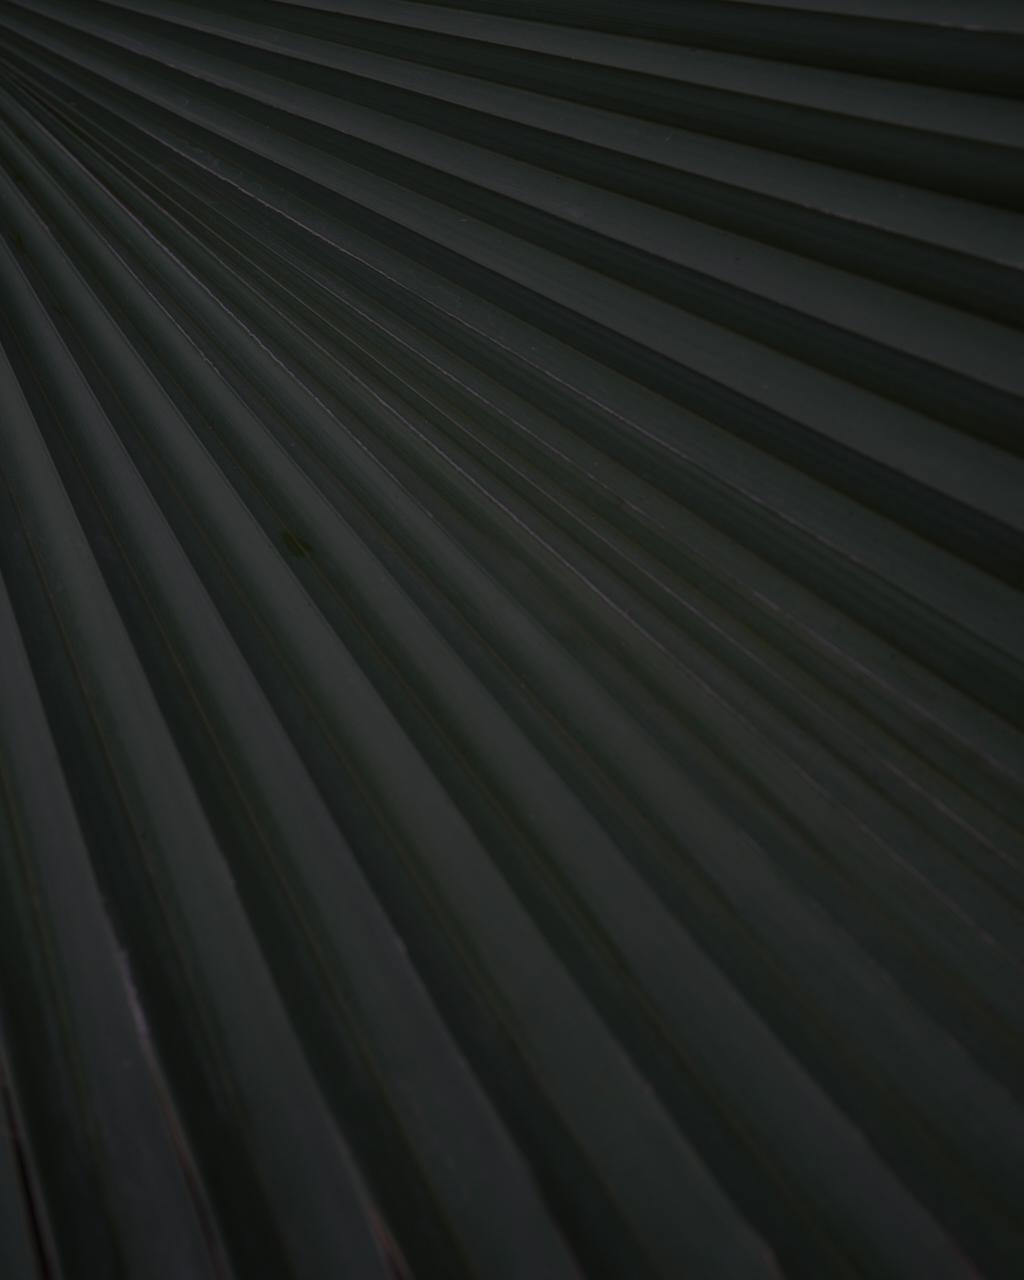 DSC06882 7.jpeg